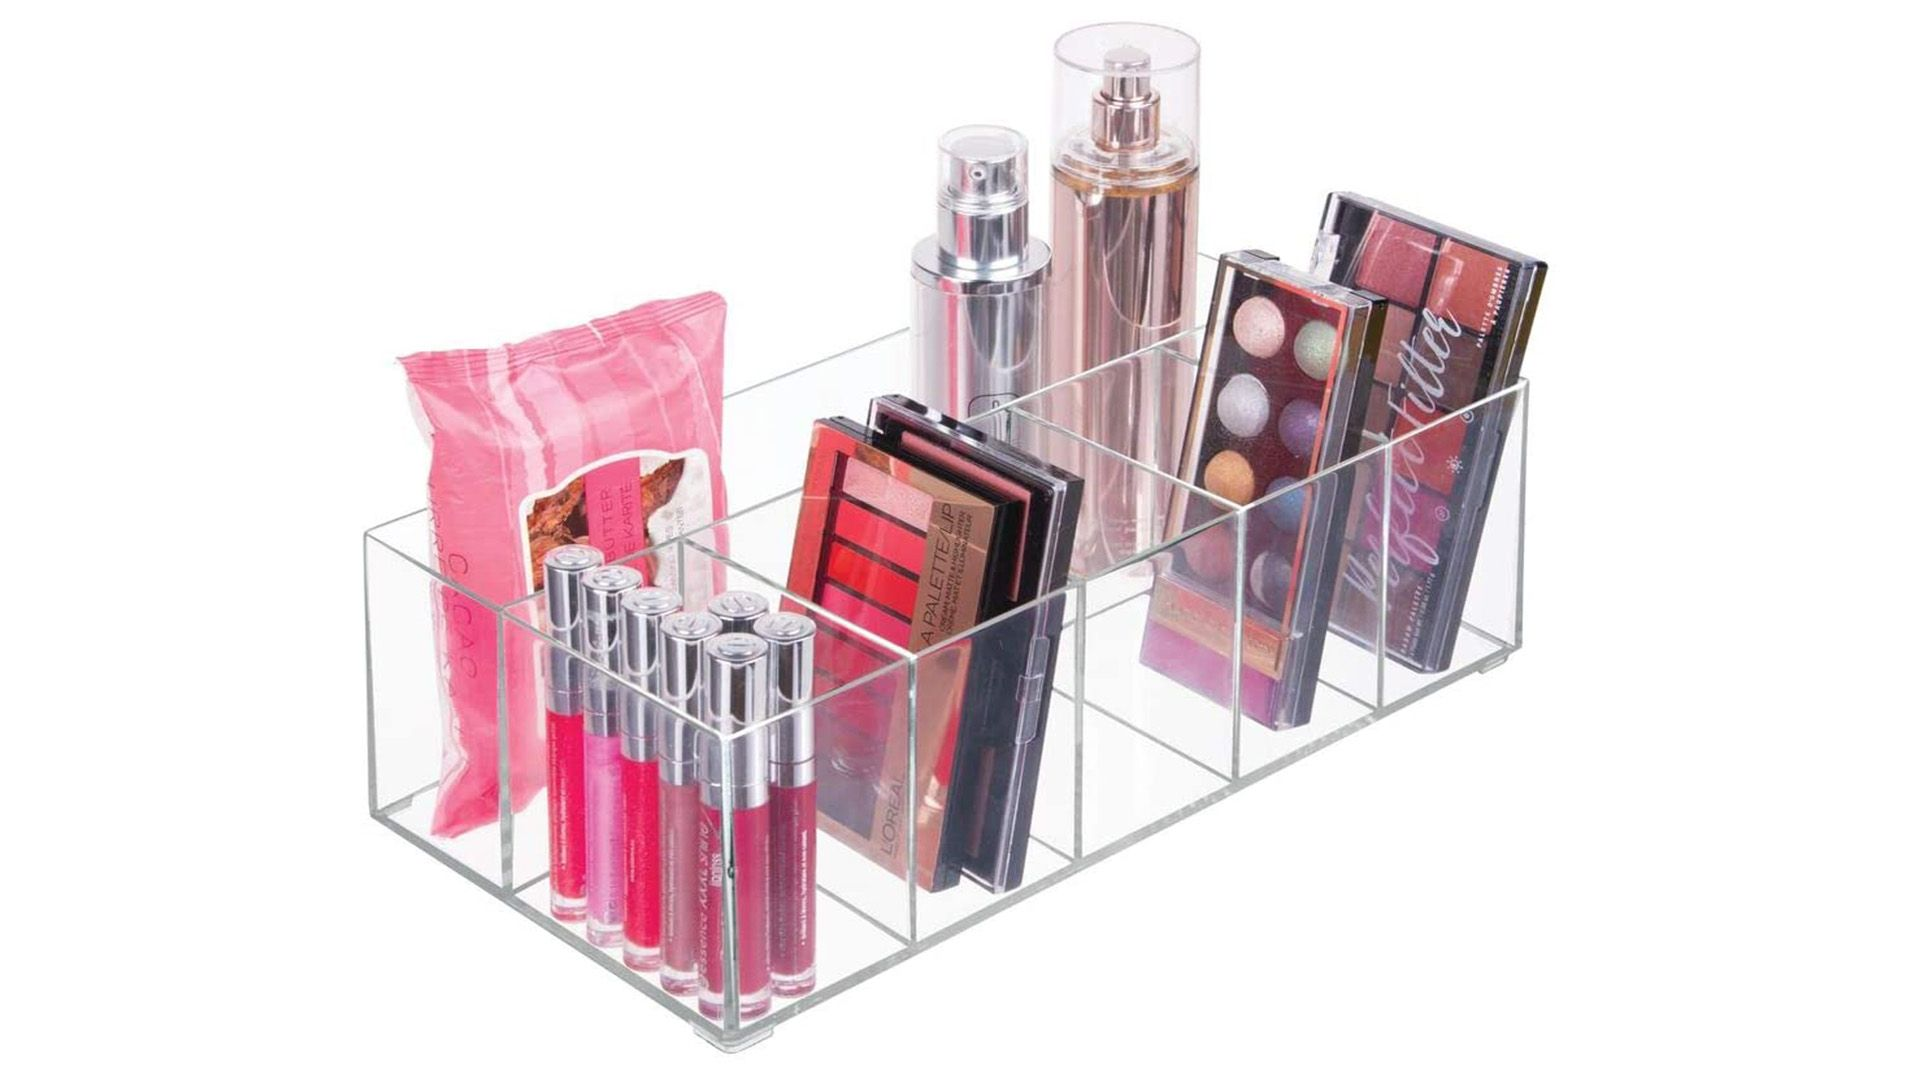 Organizador de maquillaje barato